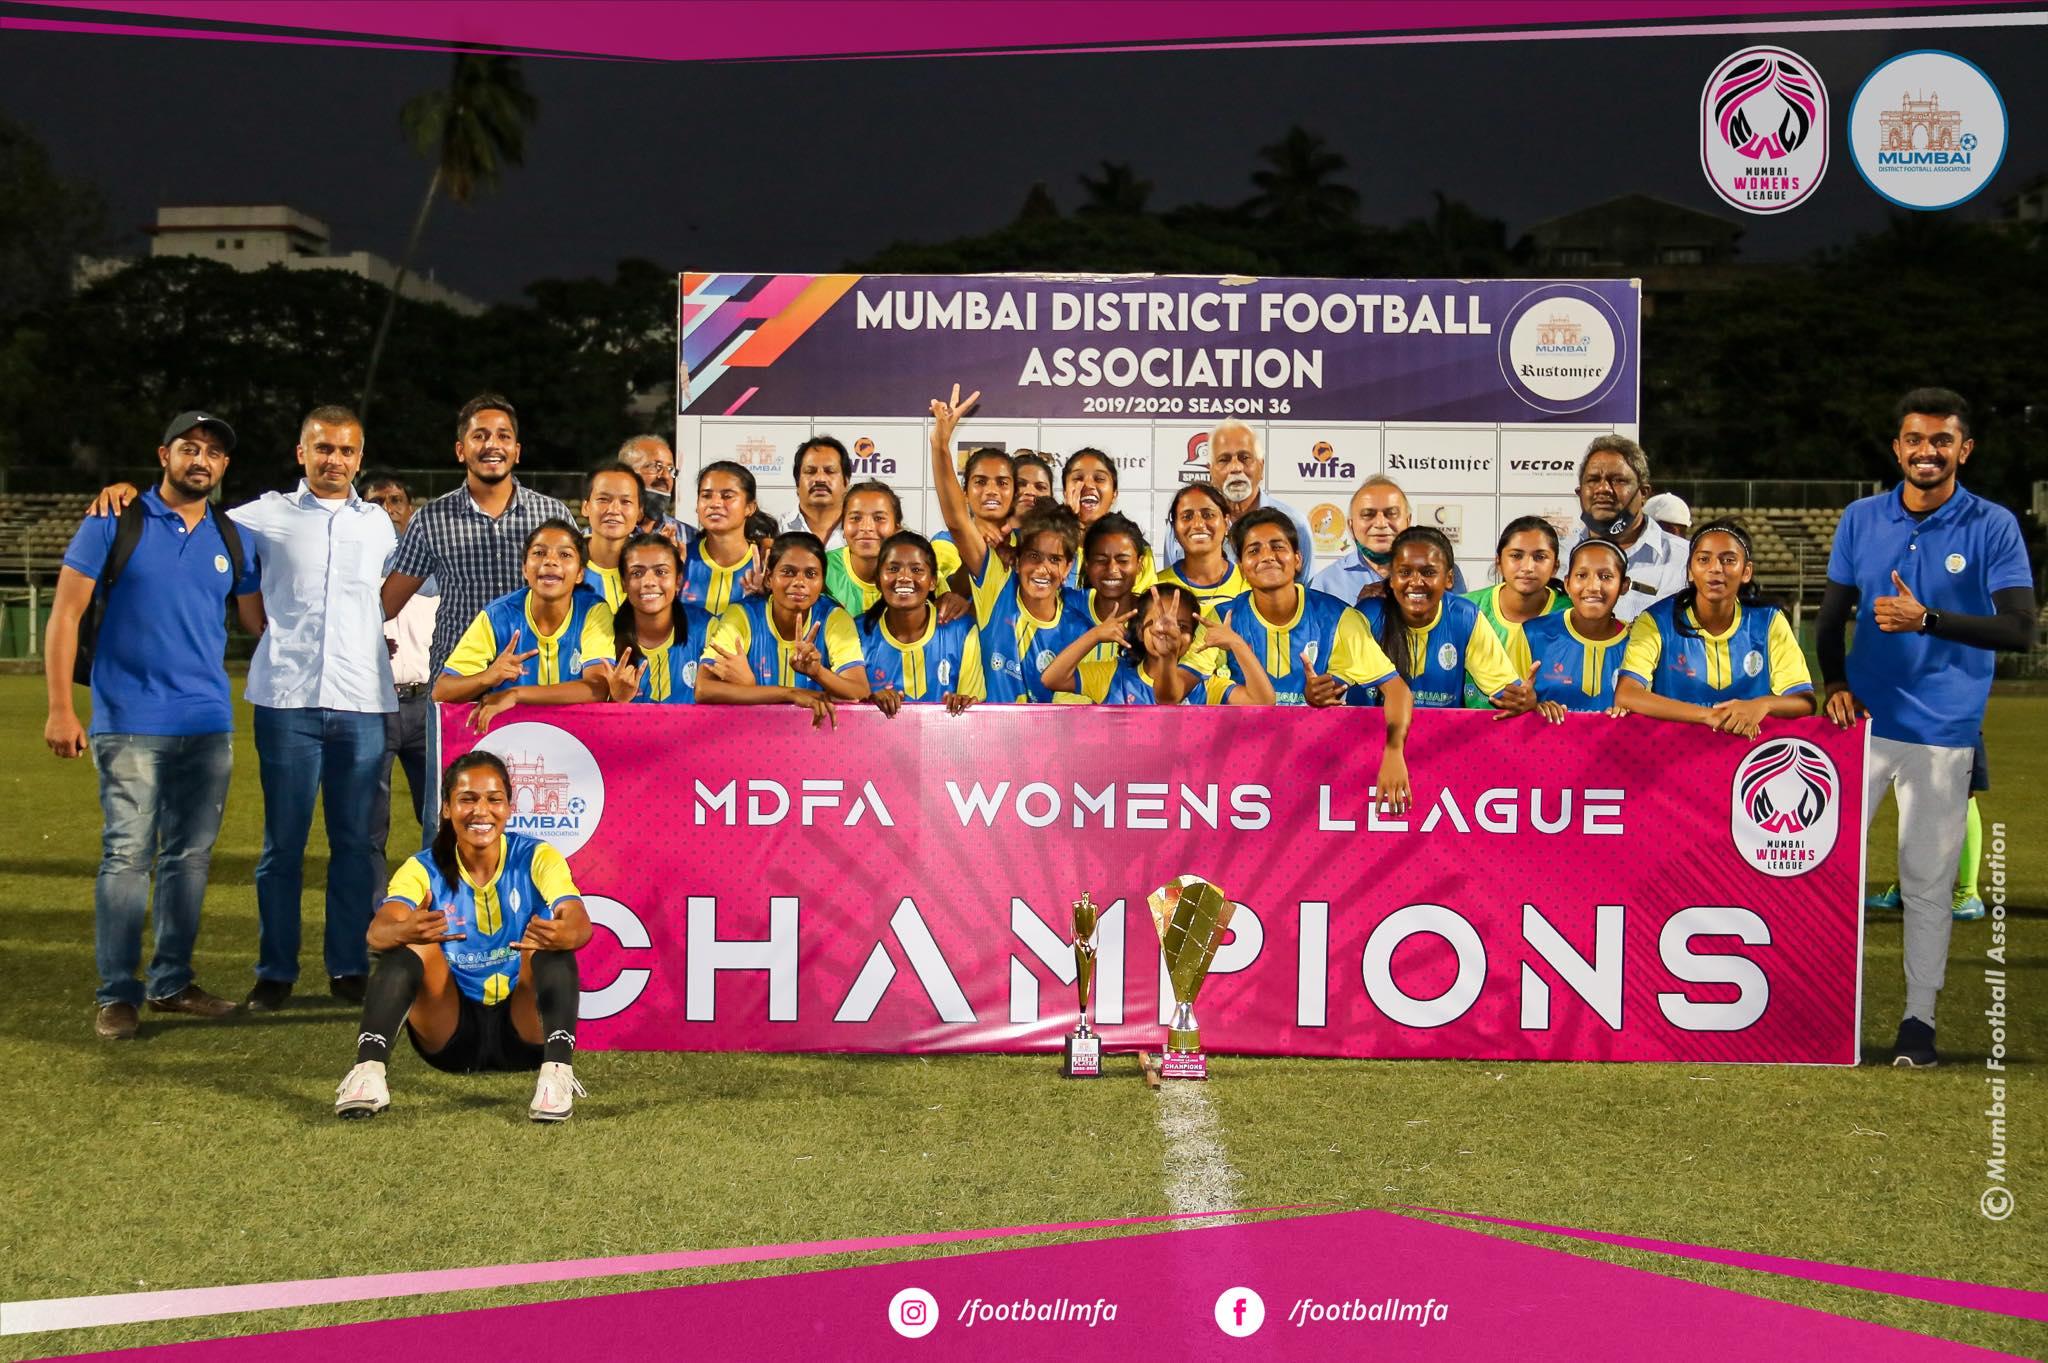 mfa women's league 2020-21 champions footie first